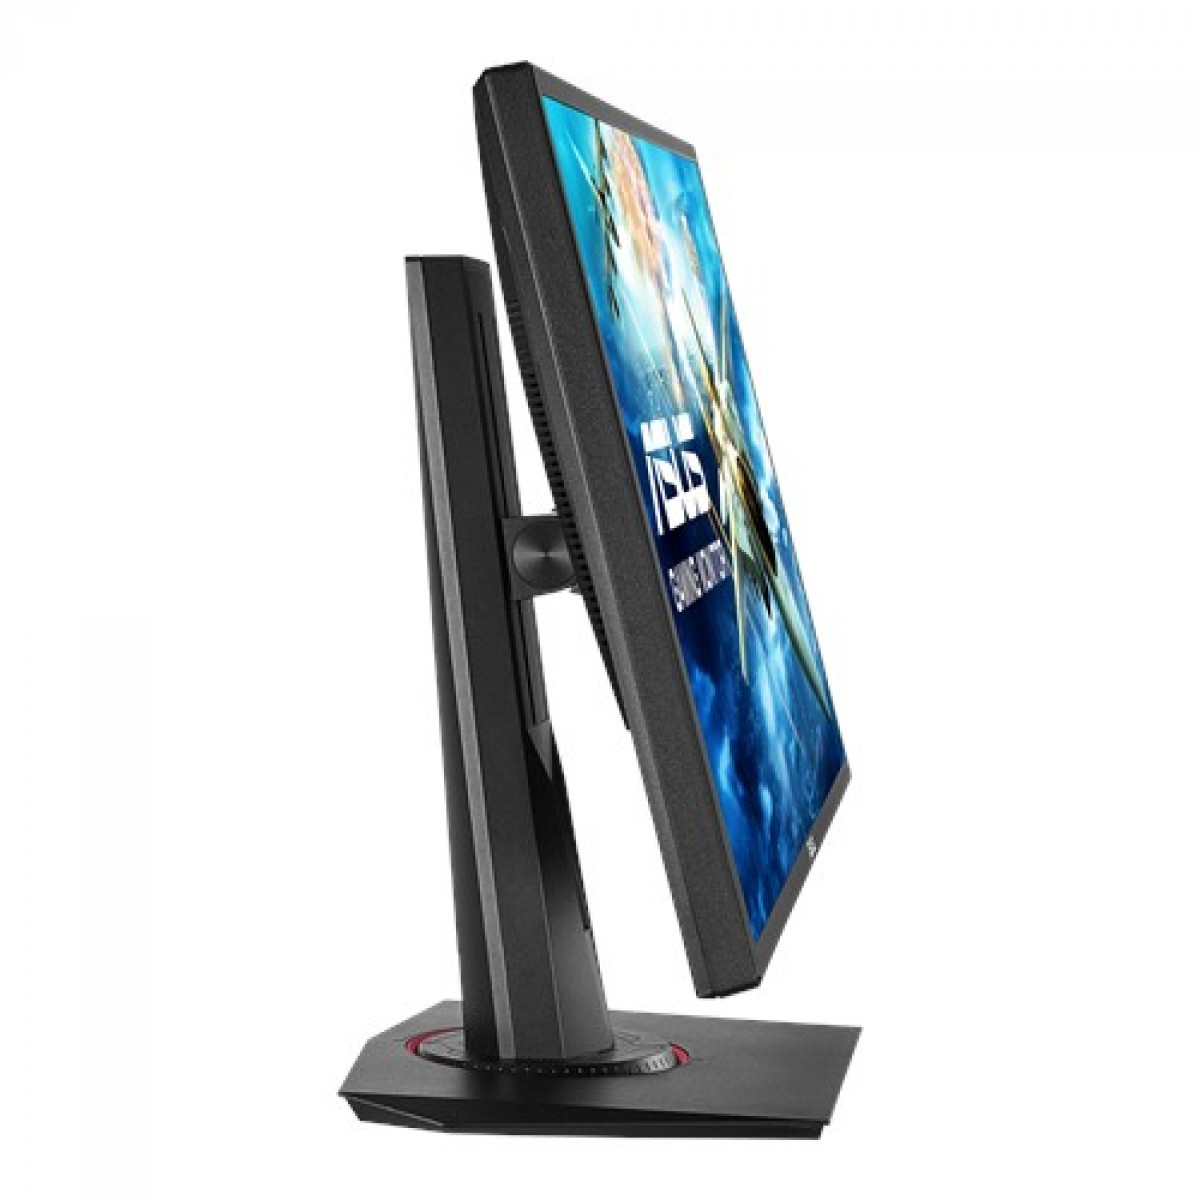 Monitor Gamer ASUS 24 Pol, Full HD, 165Hz, 0,5ms, G-Sync, HDMI/DP/DVI, Altura Ajustável, VG248QG